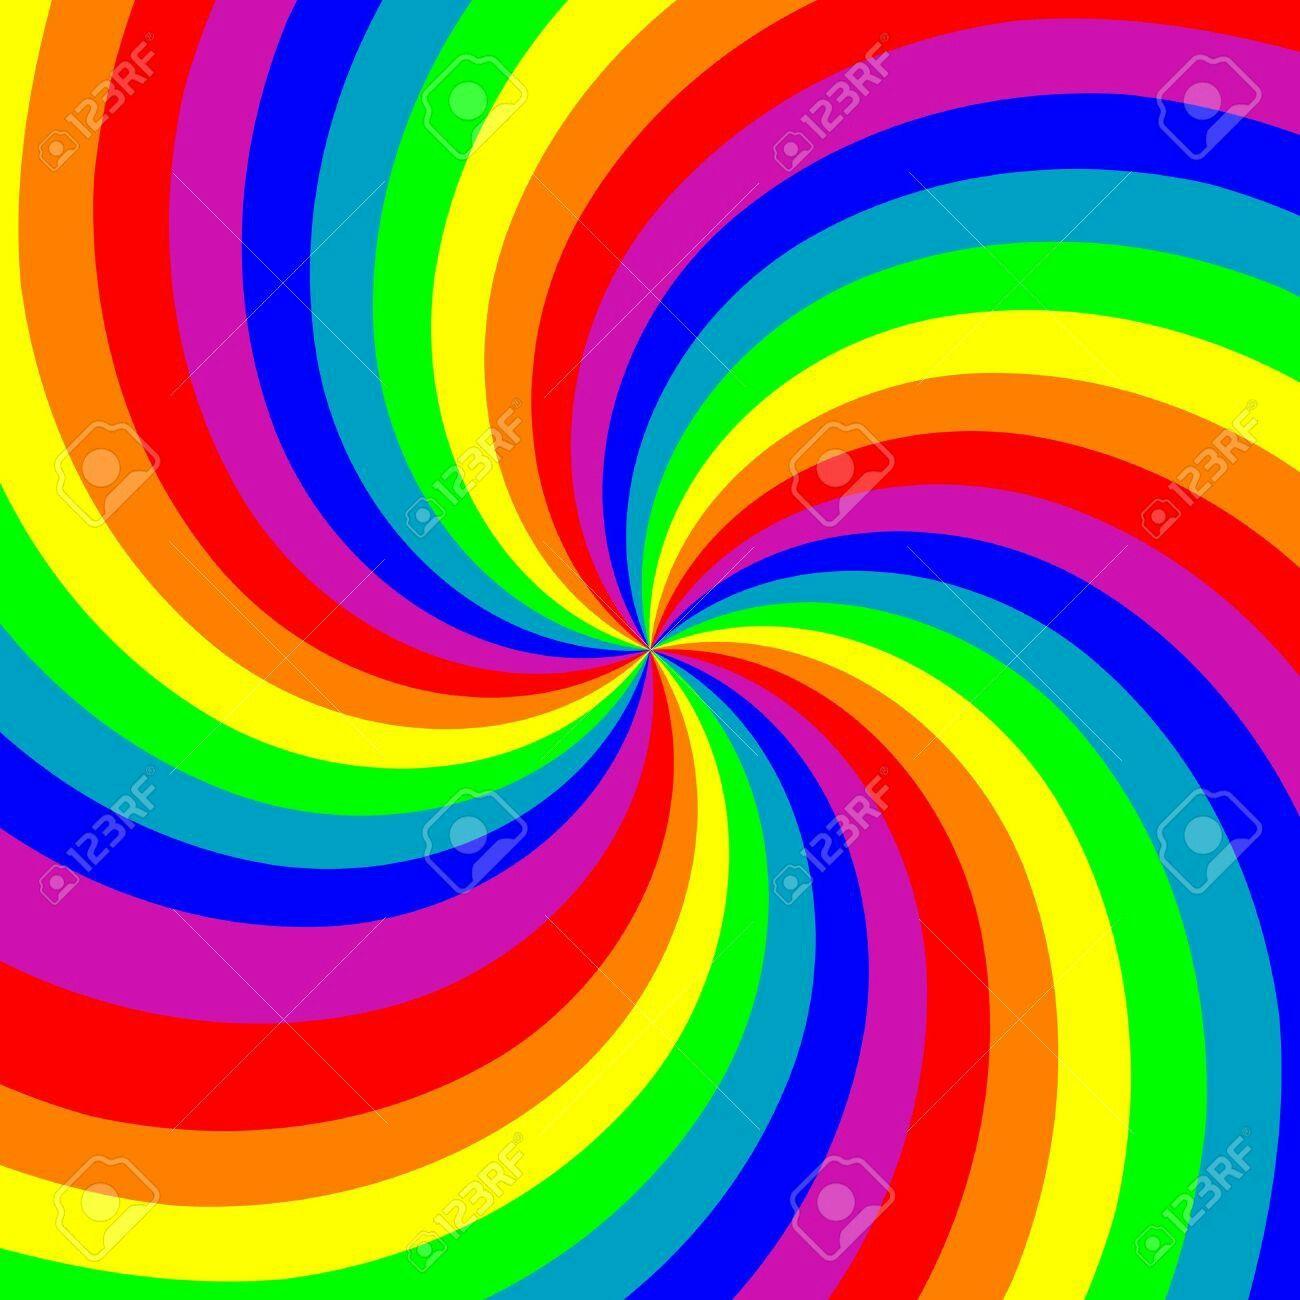 Rainbow Lollipop Swirl Wallpaper Rainbow Wallpaper Wallpaper Rainbow Lollipops